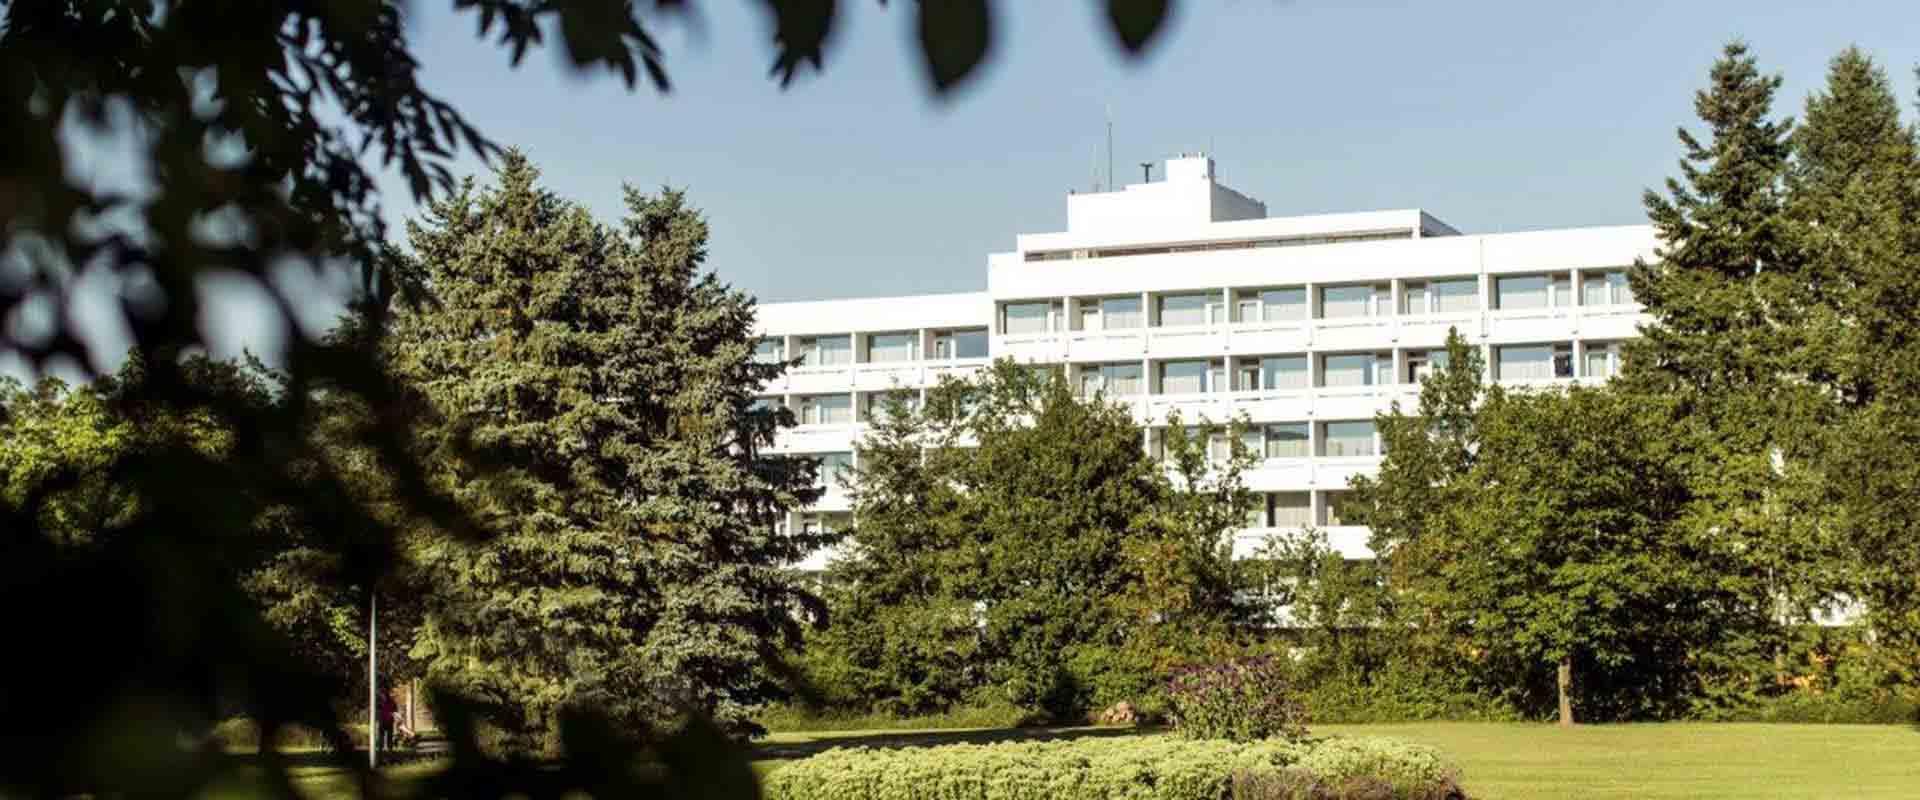 Gebäude des MEDIAN Reha-Zentrums Bernkastel-Kues Klinik Bernkastel